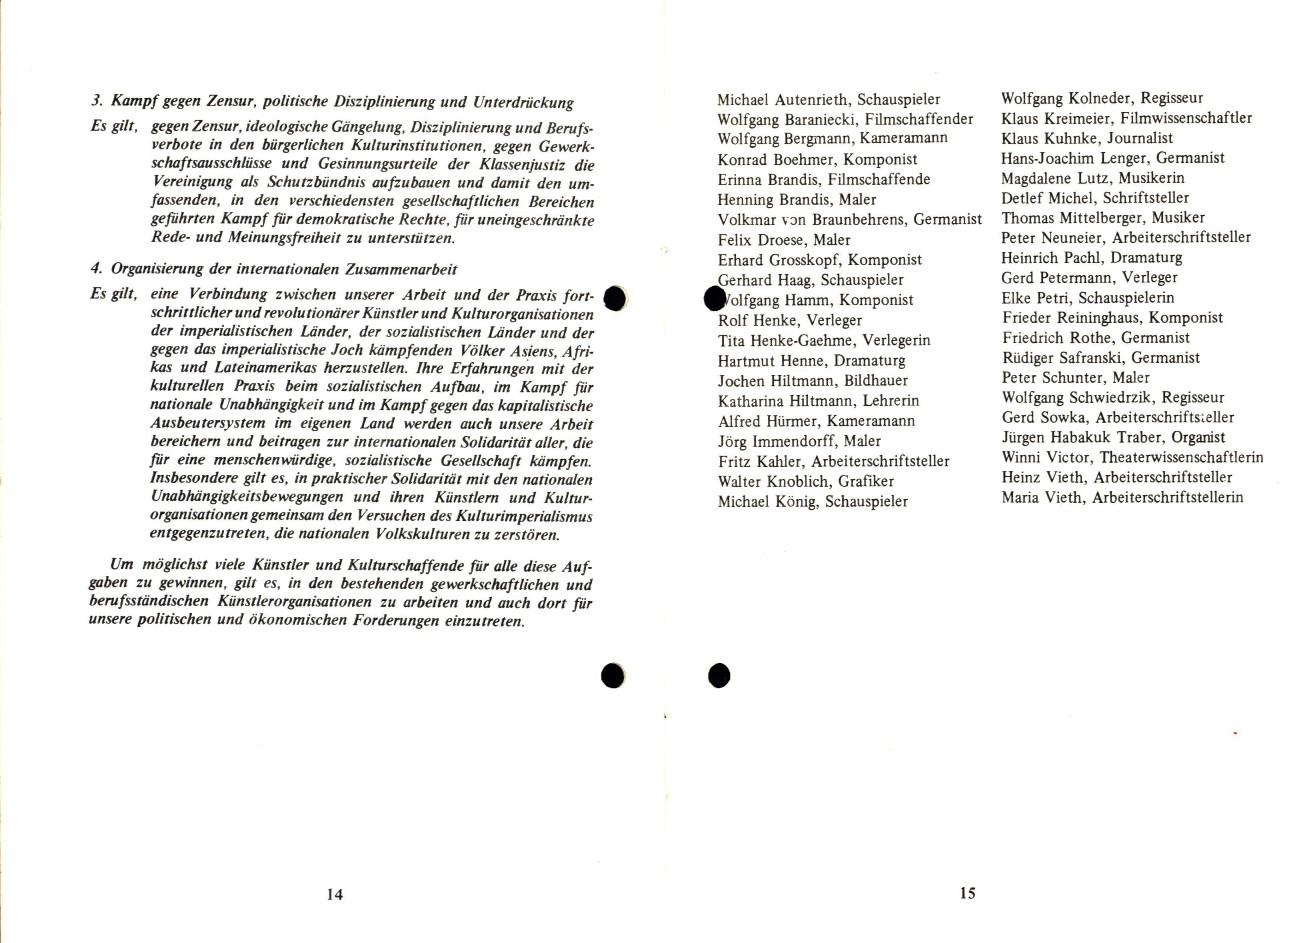 VSK_1974_Manifest_09